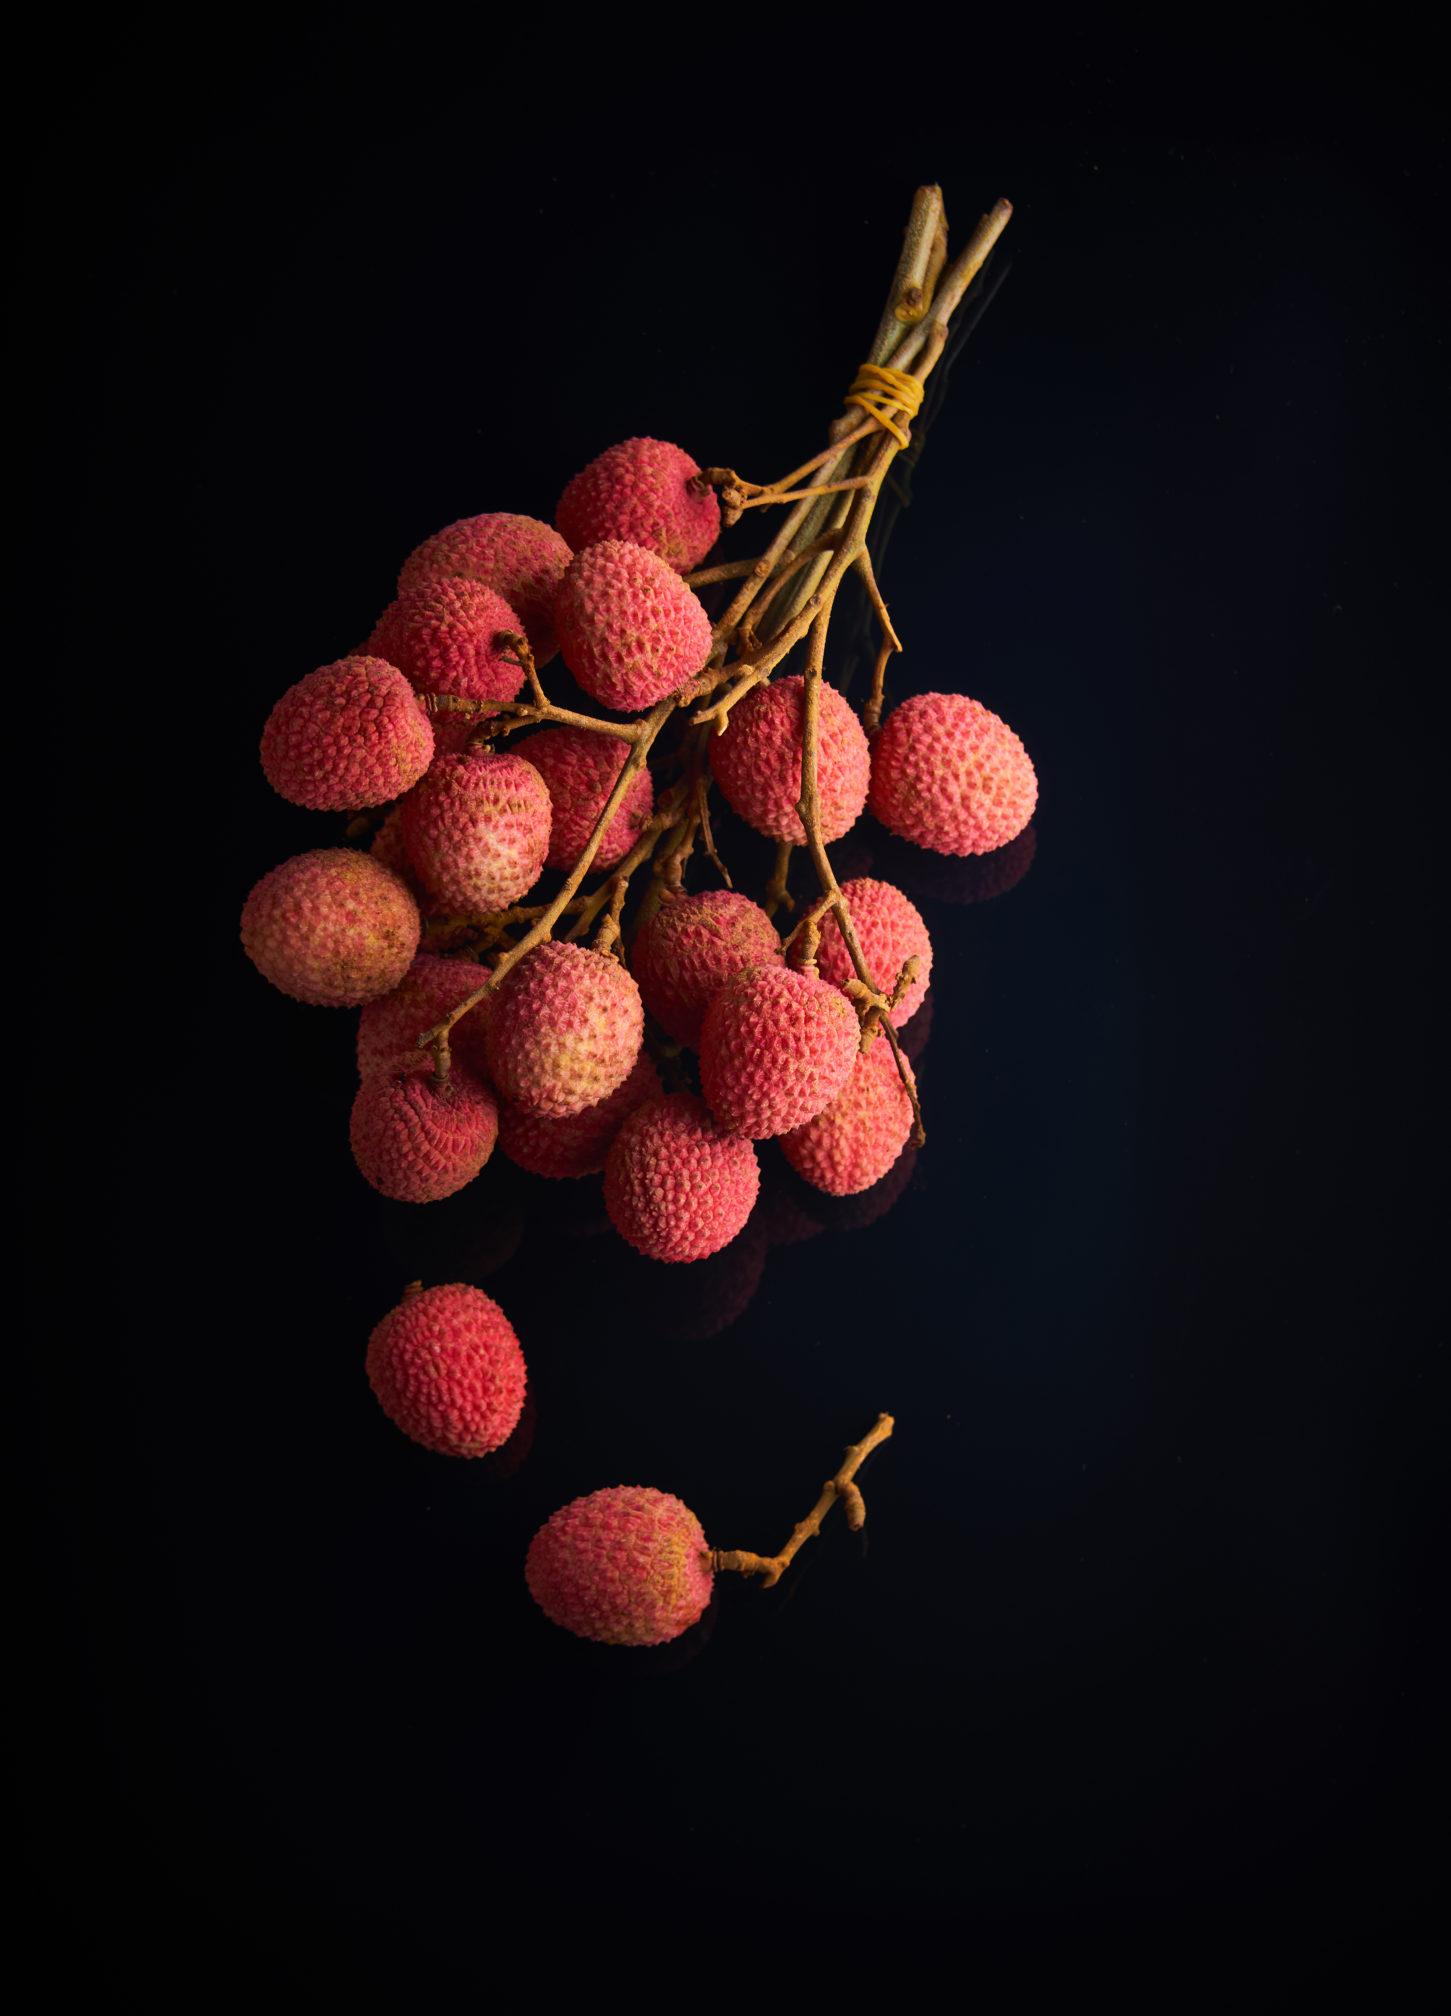 capexo-lilot-fruits-exotique-litchi-reunion-ile-maurice-madagascar-bresil-israel-mexique